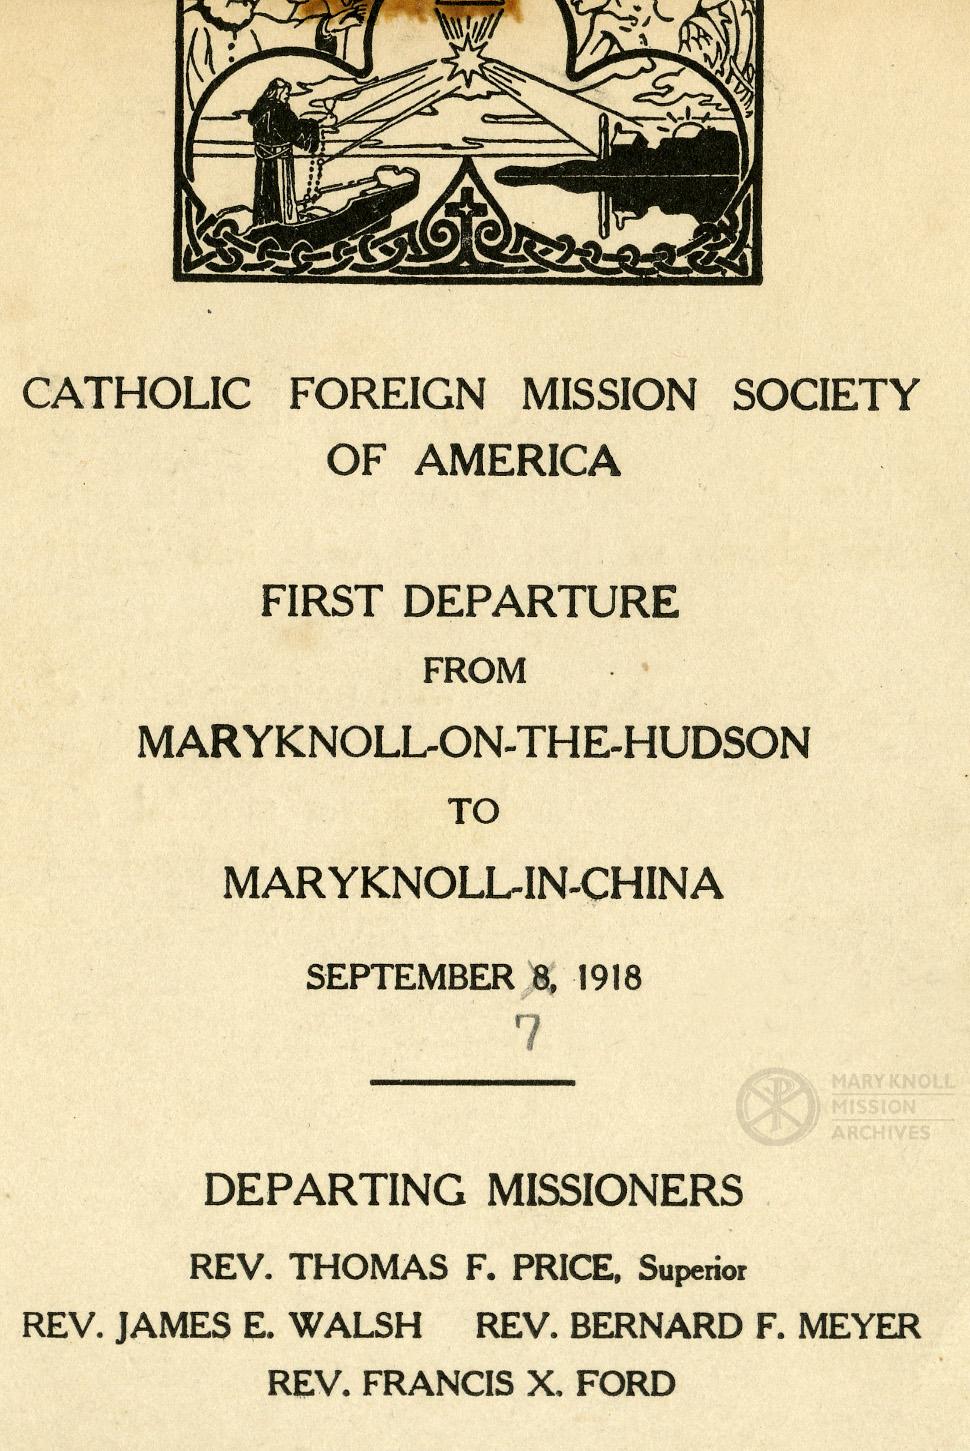 Departure Program, 1918